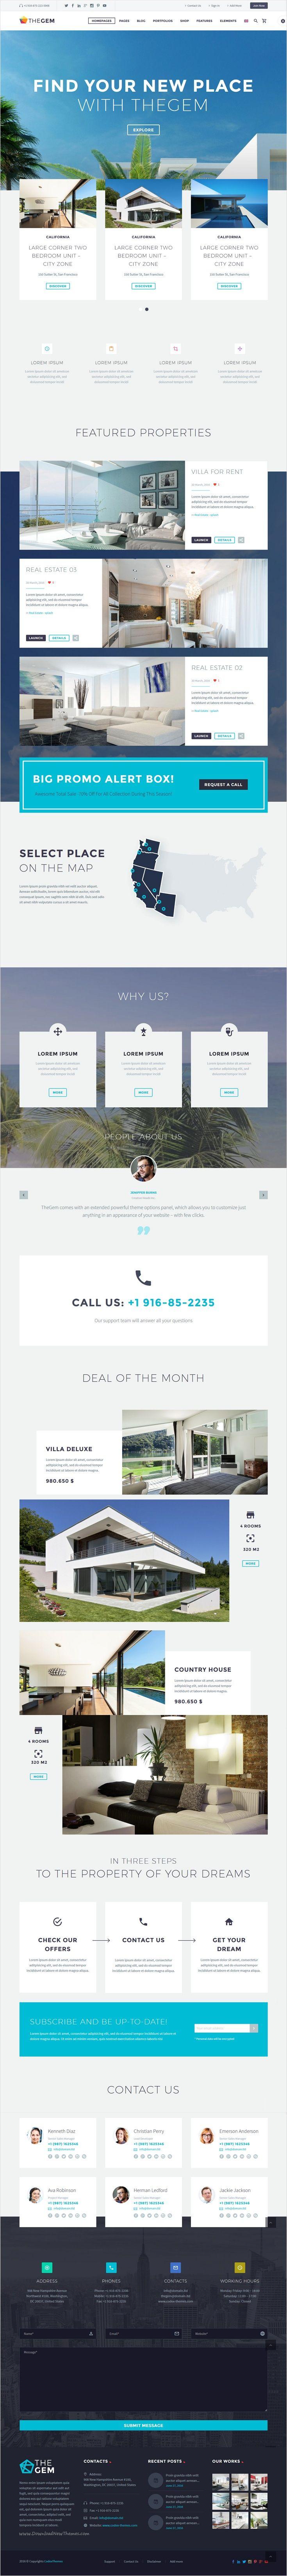 TheGem   Creative Multi Purpose High Performance WordPress Theme  Flat Web  DesignApp. Best 25  Apartment websites ideas on Pinterest   Photo layouts